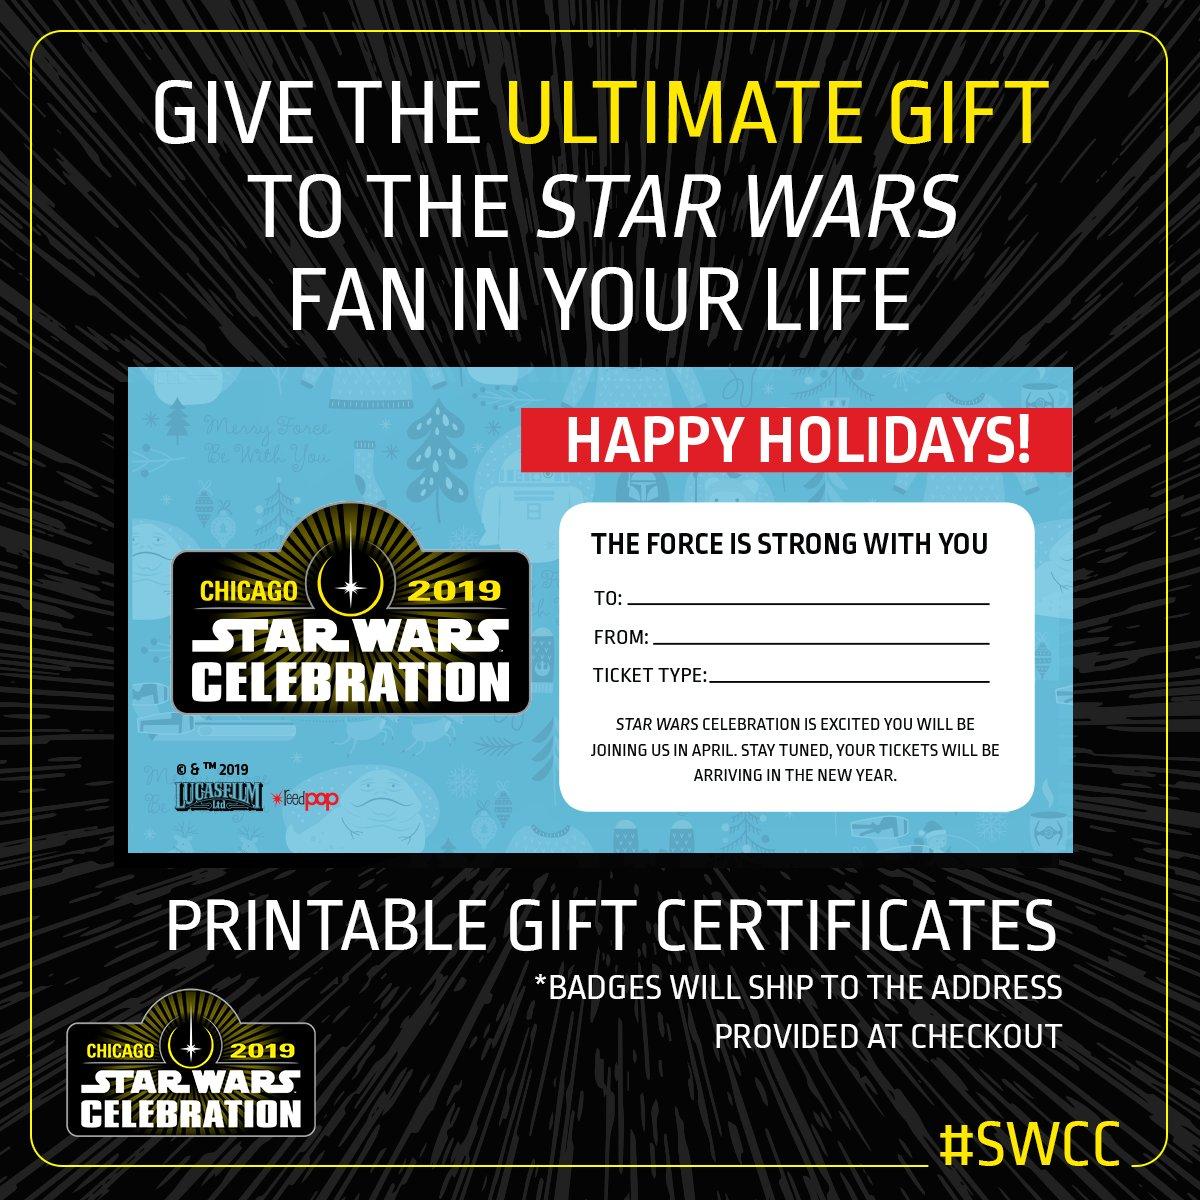 star wars celebration coupon code 2019